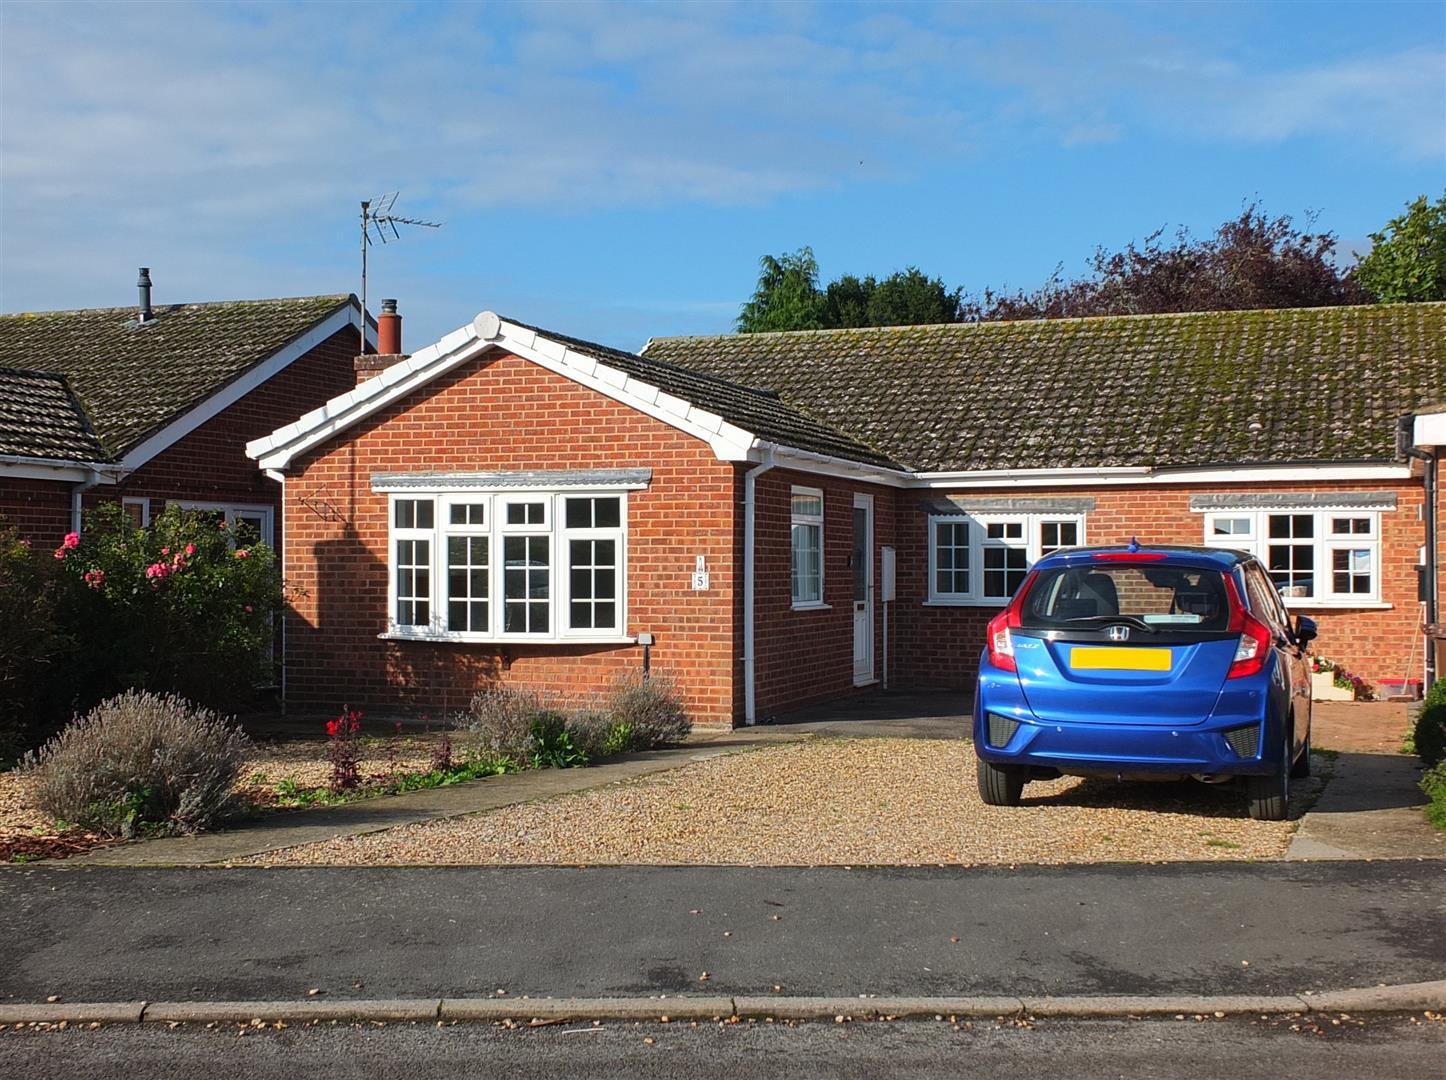 3 bed semi-detached bungalow for sale in Nene Meadows, Sutton Bridge Spalding - Property Image 1